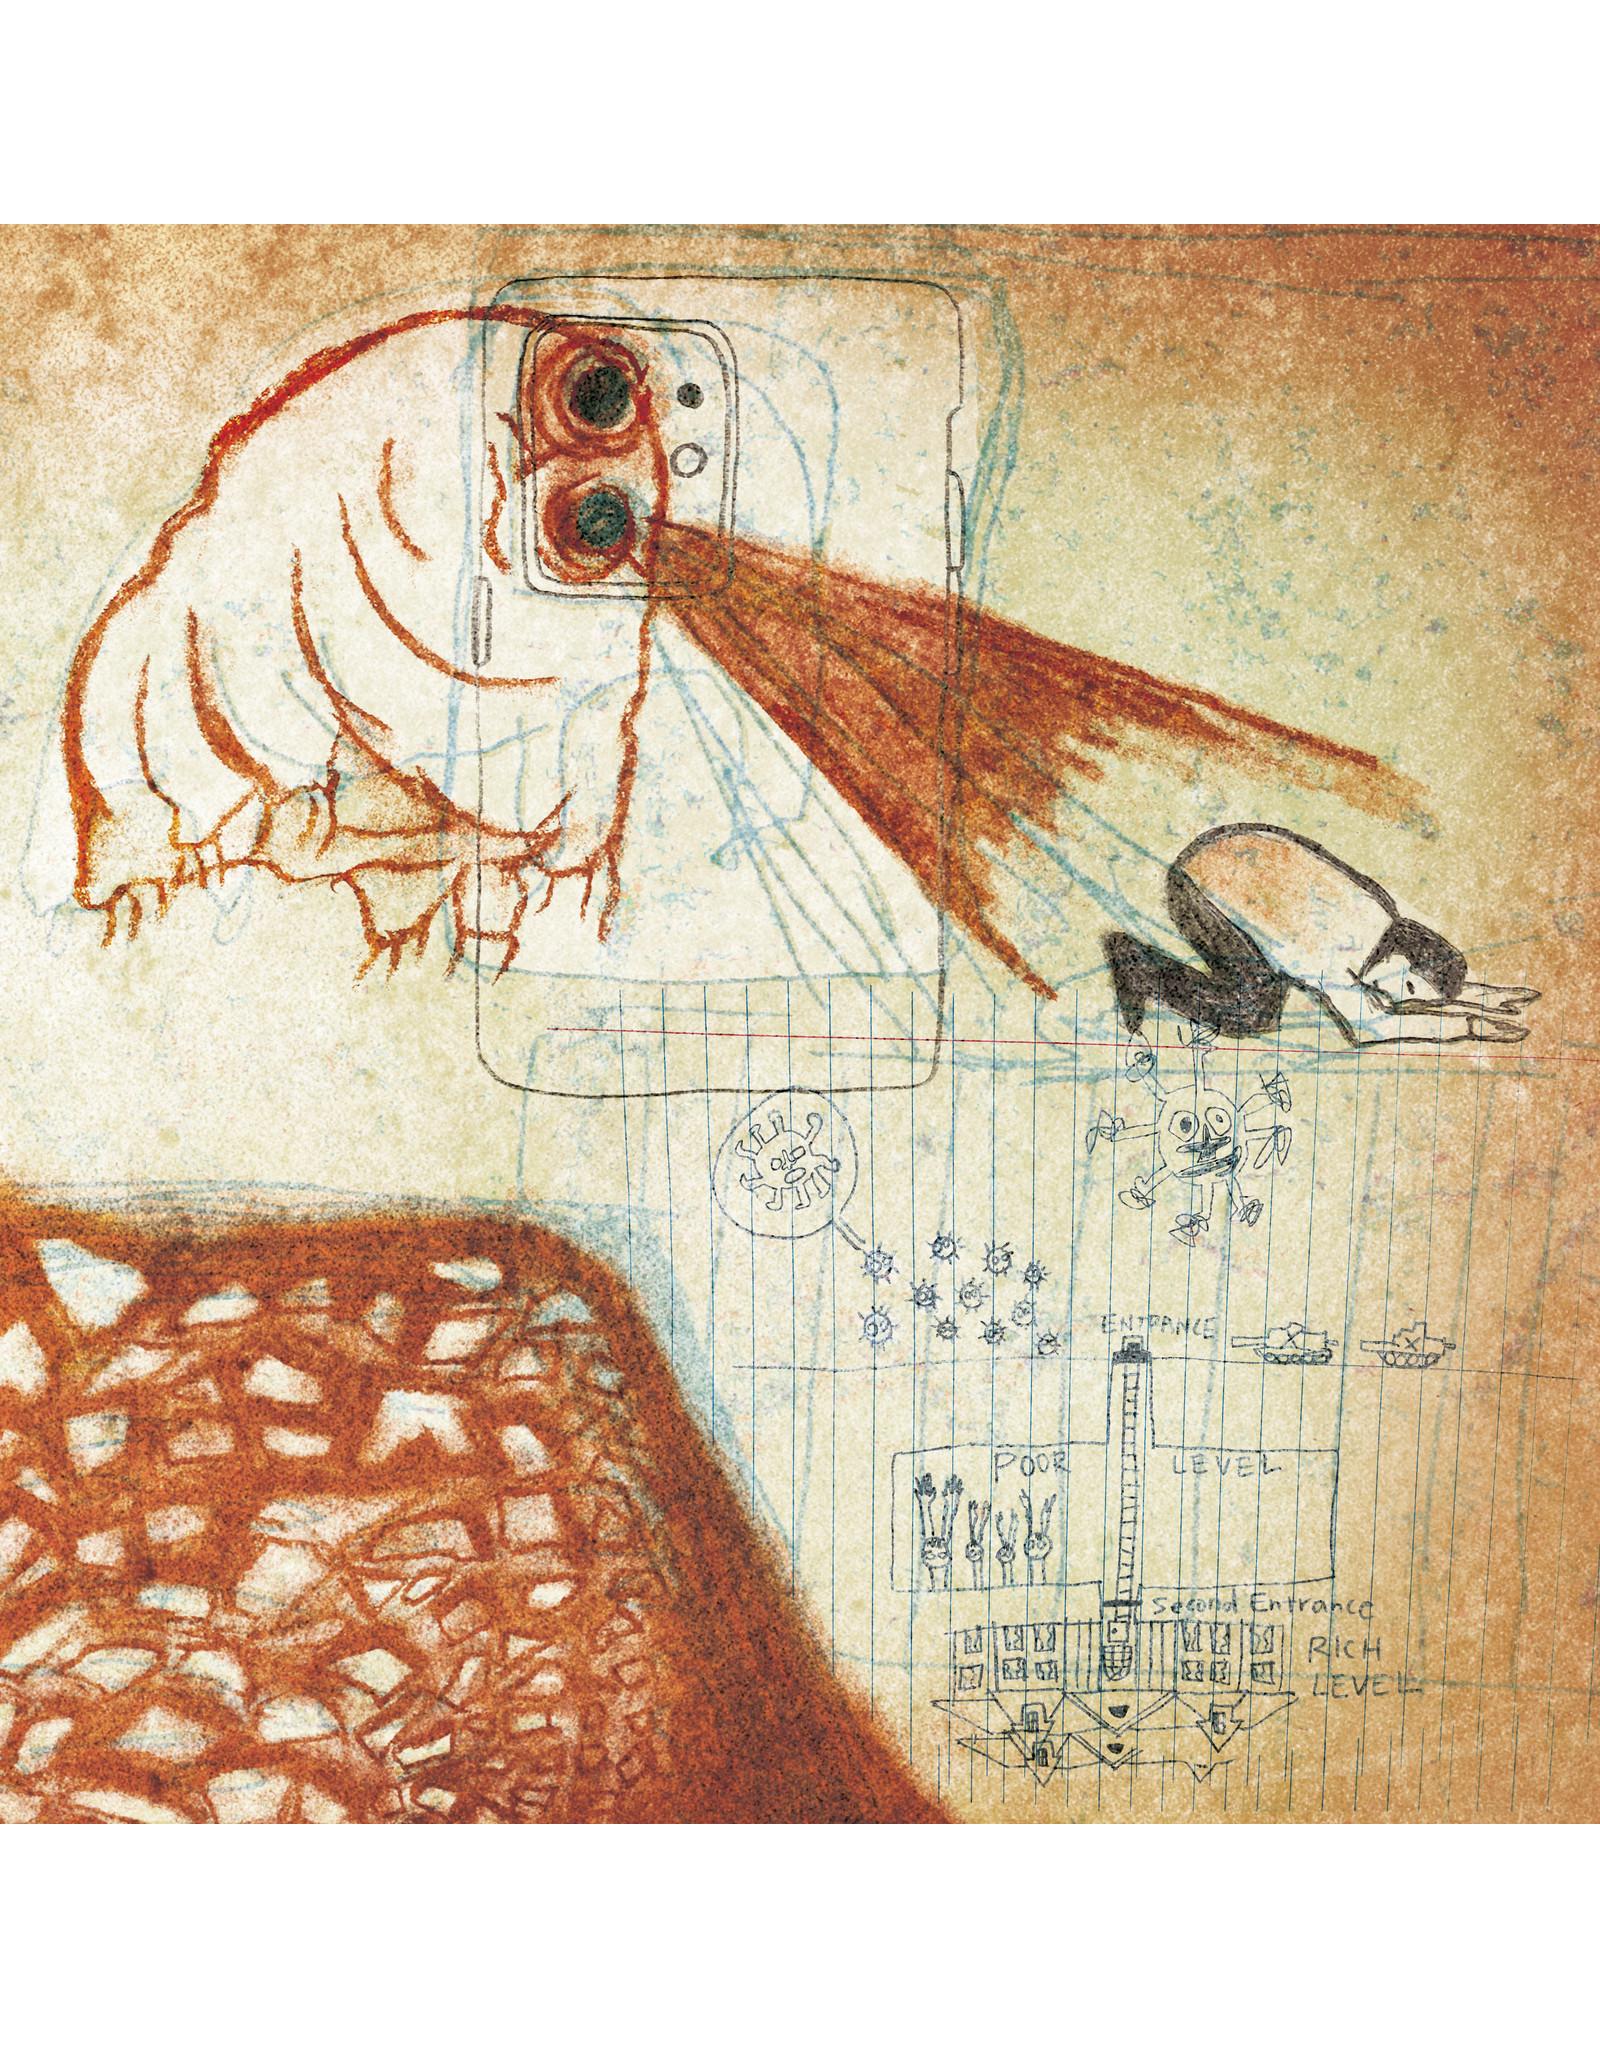 New Vinyl Deerhoof - Future Teenage Cave Artists (Colored) LP